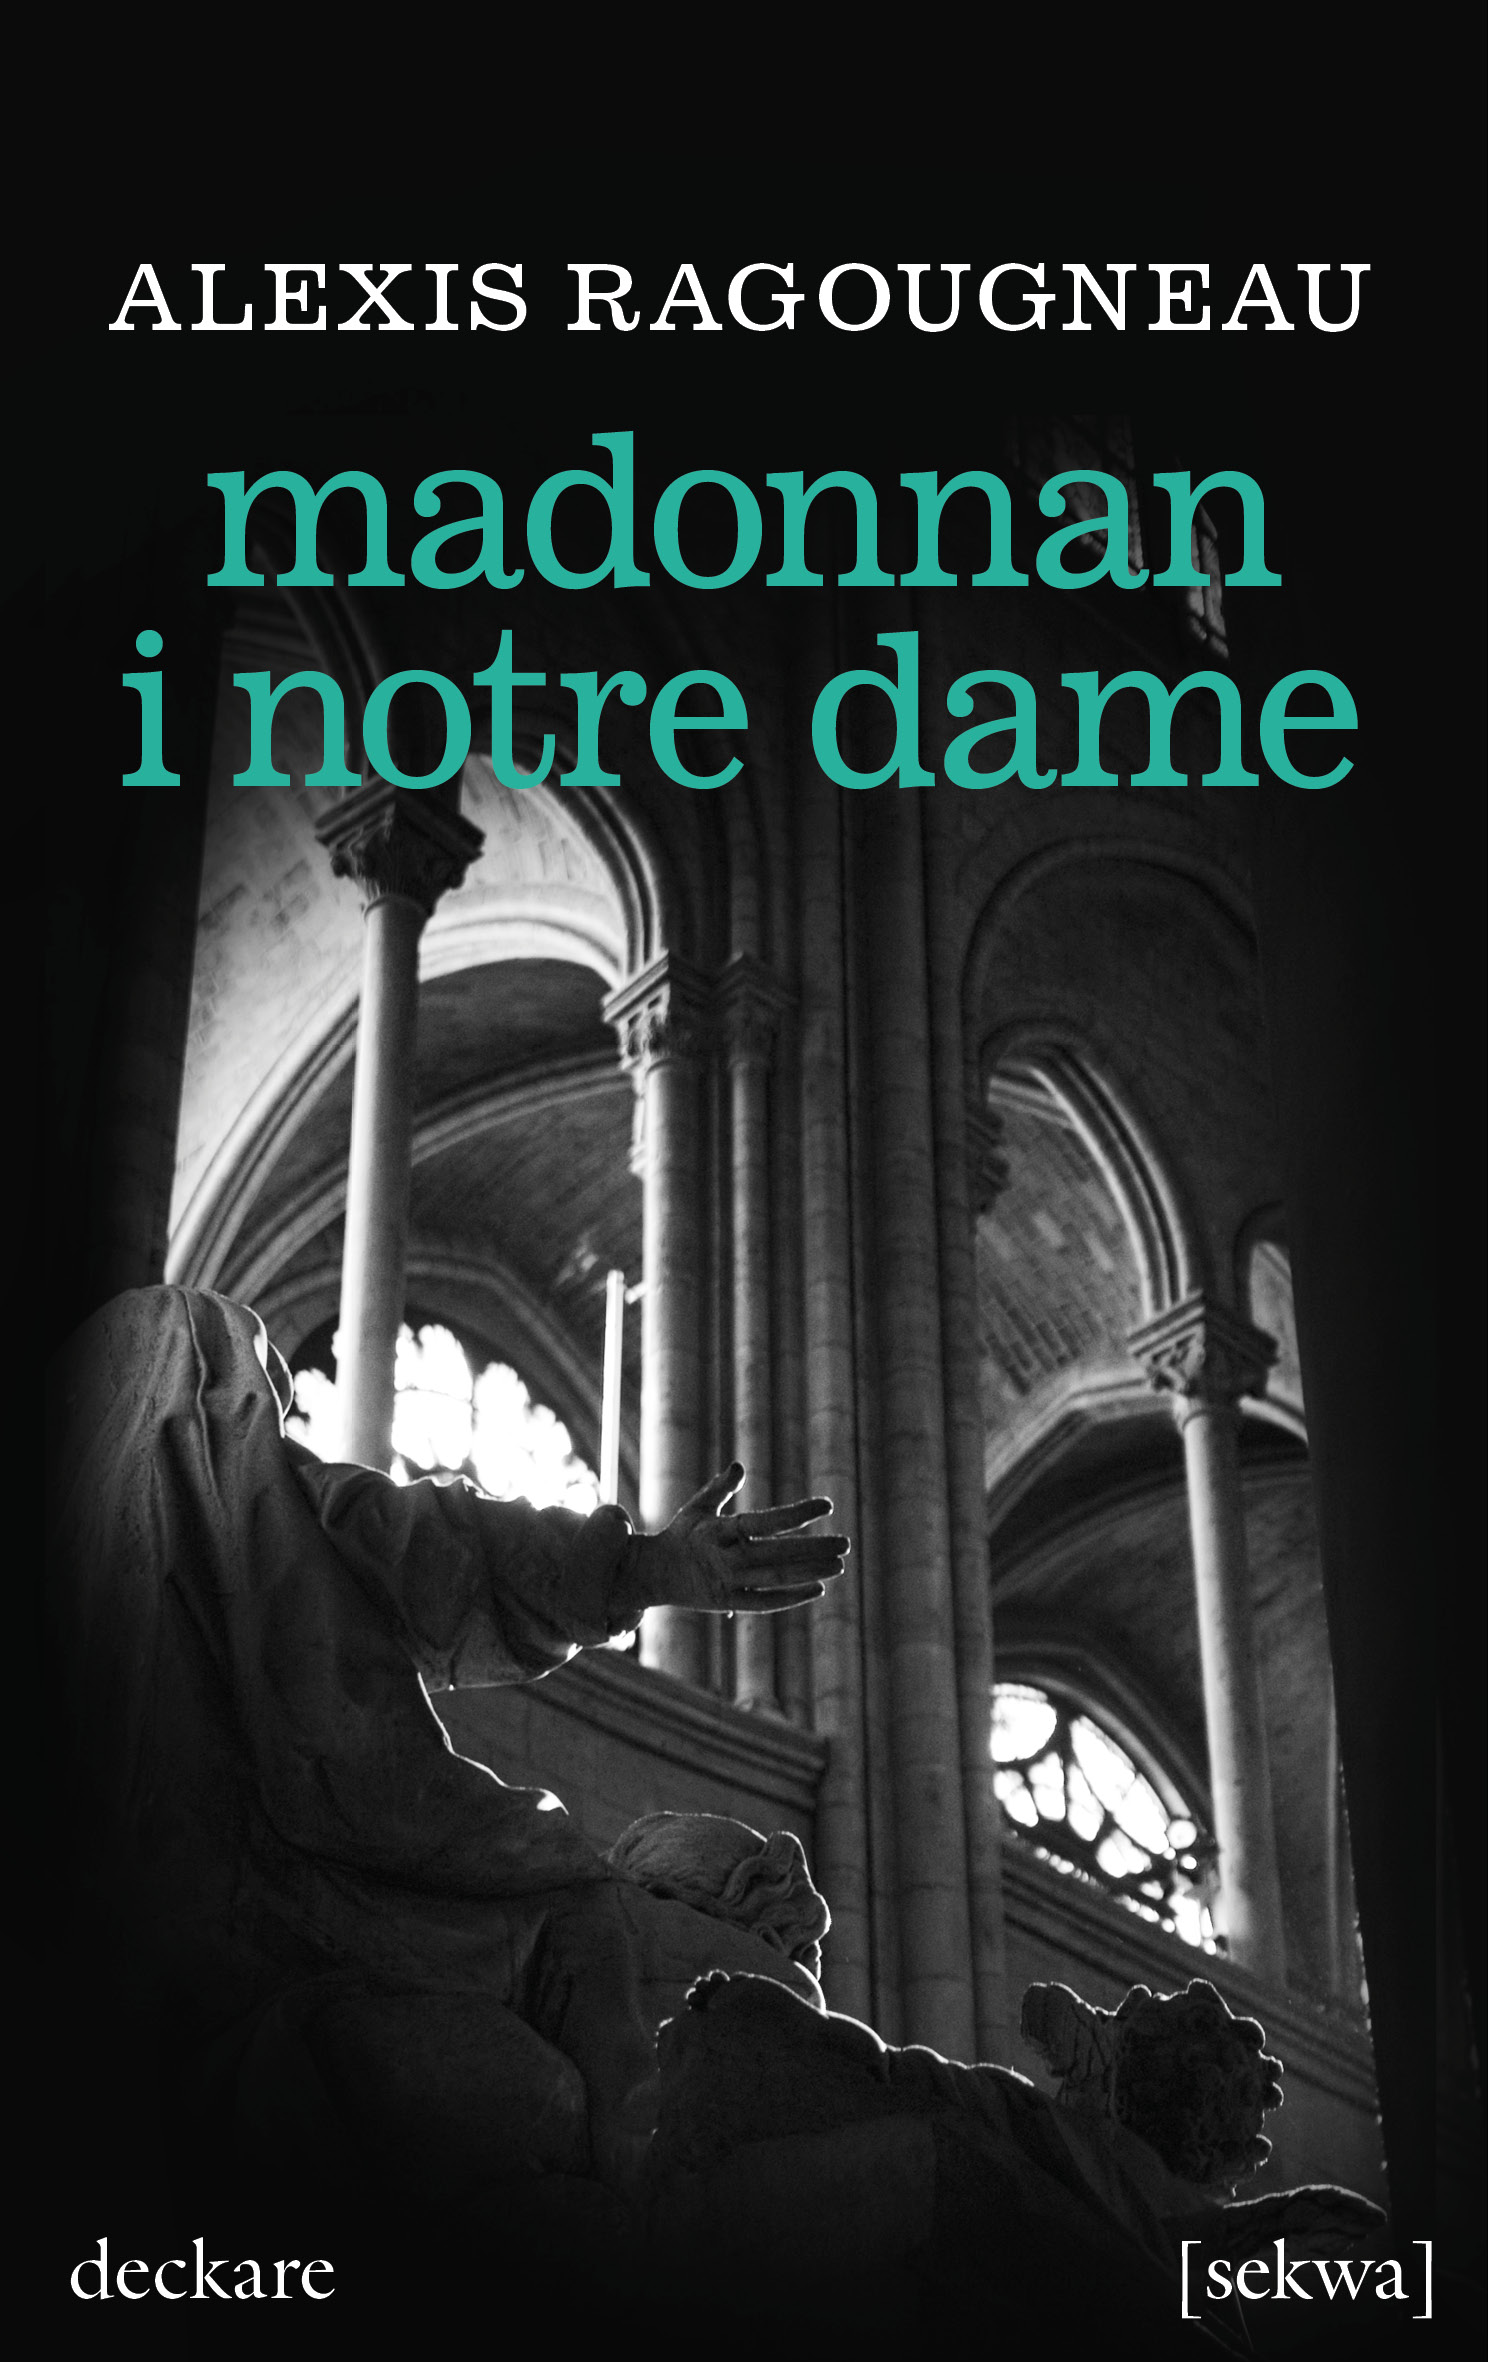 Alexis Ragougneau: Madonnan i Notre Dame